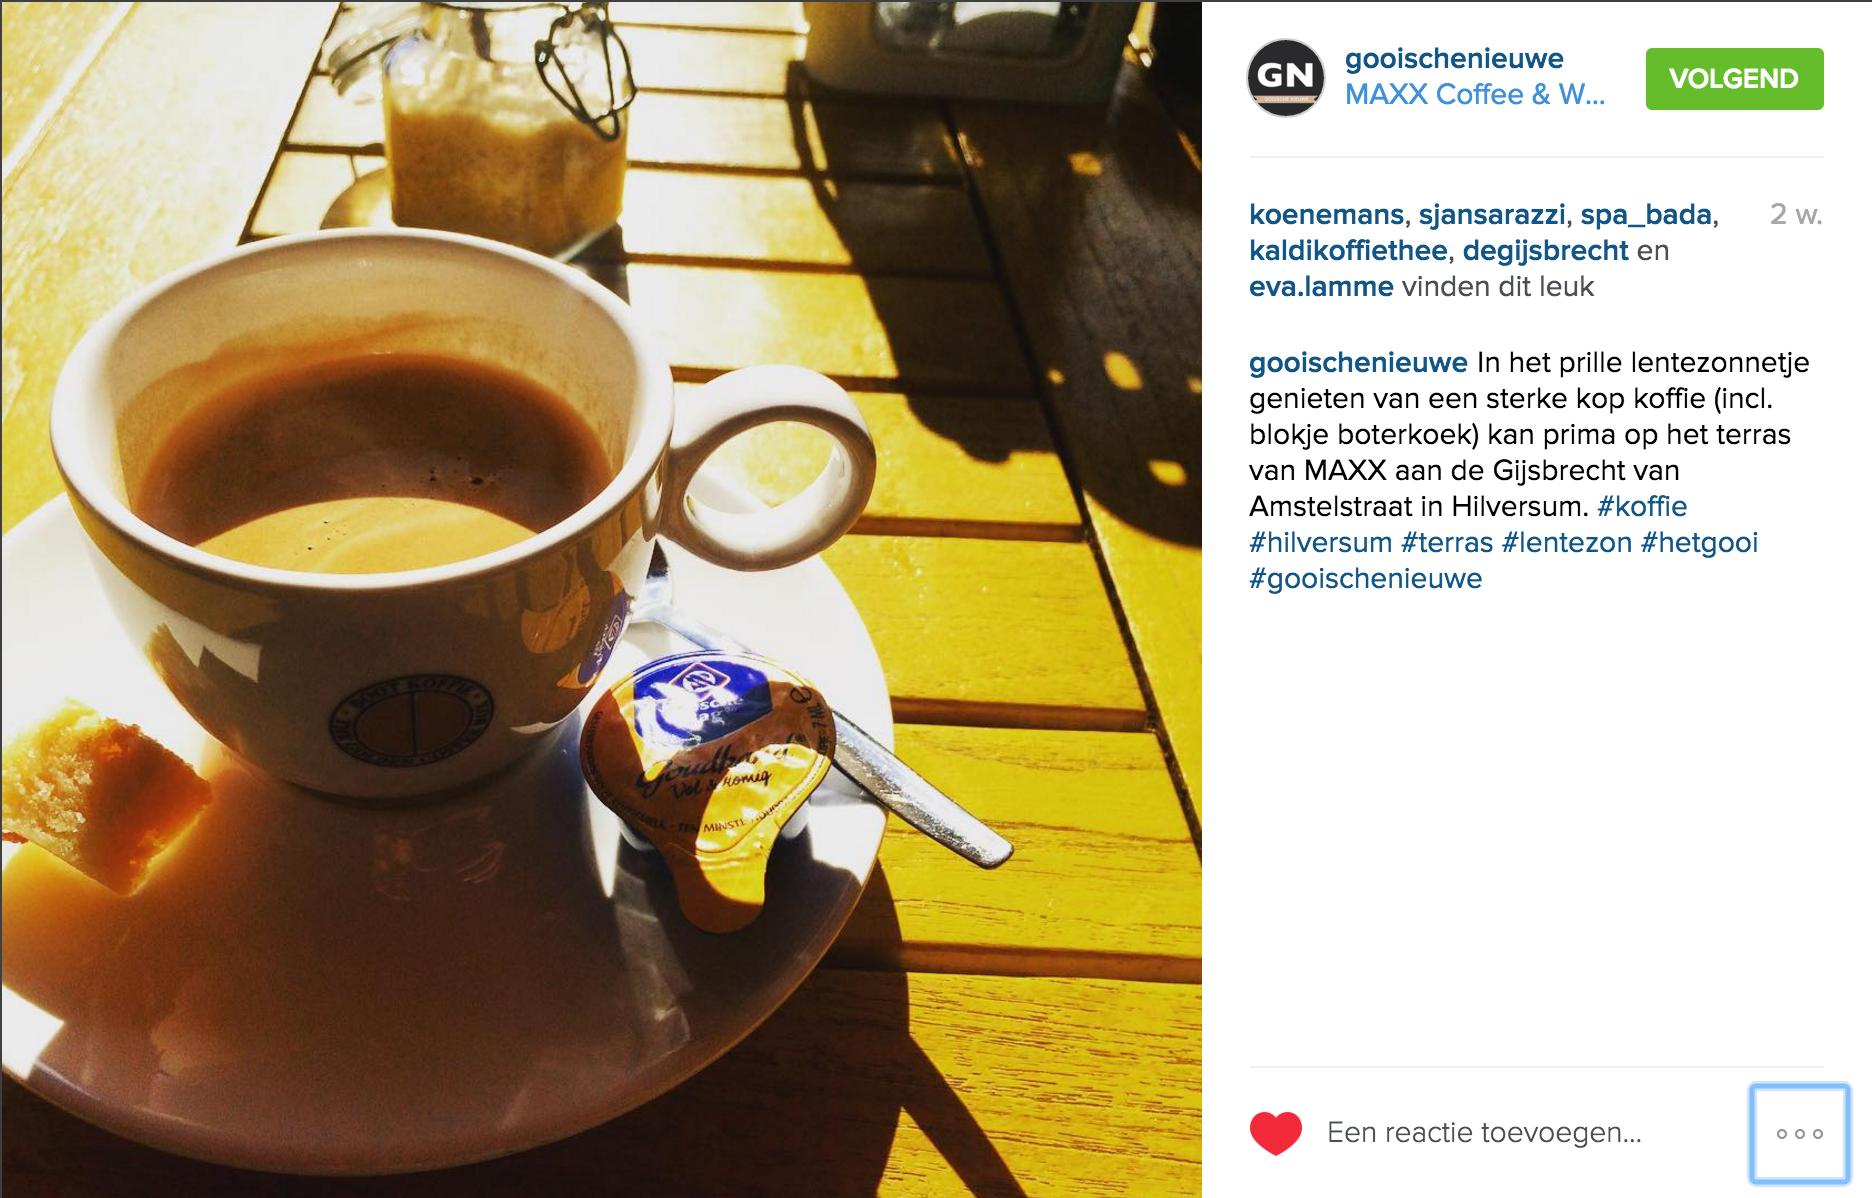 Koffie op instagram